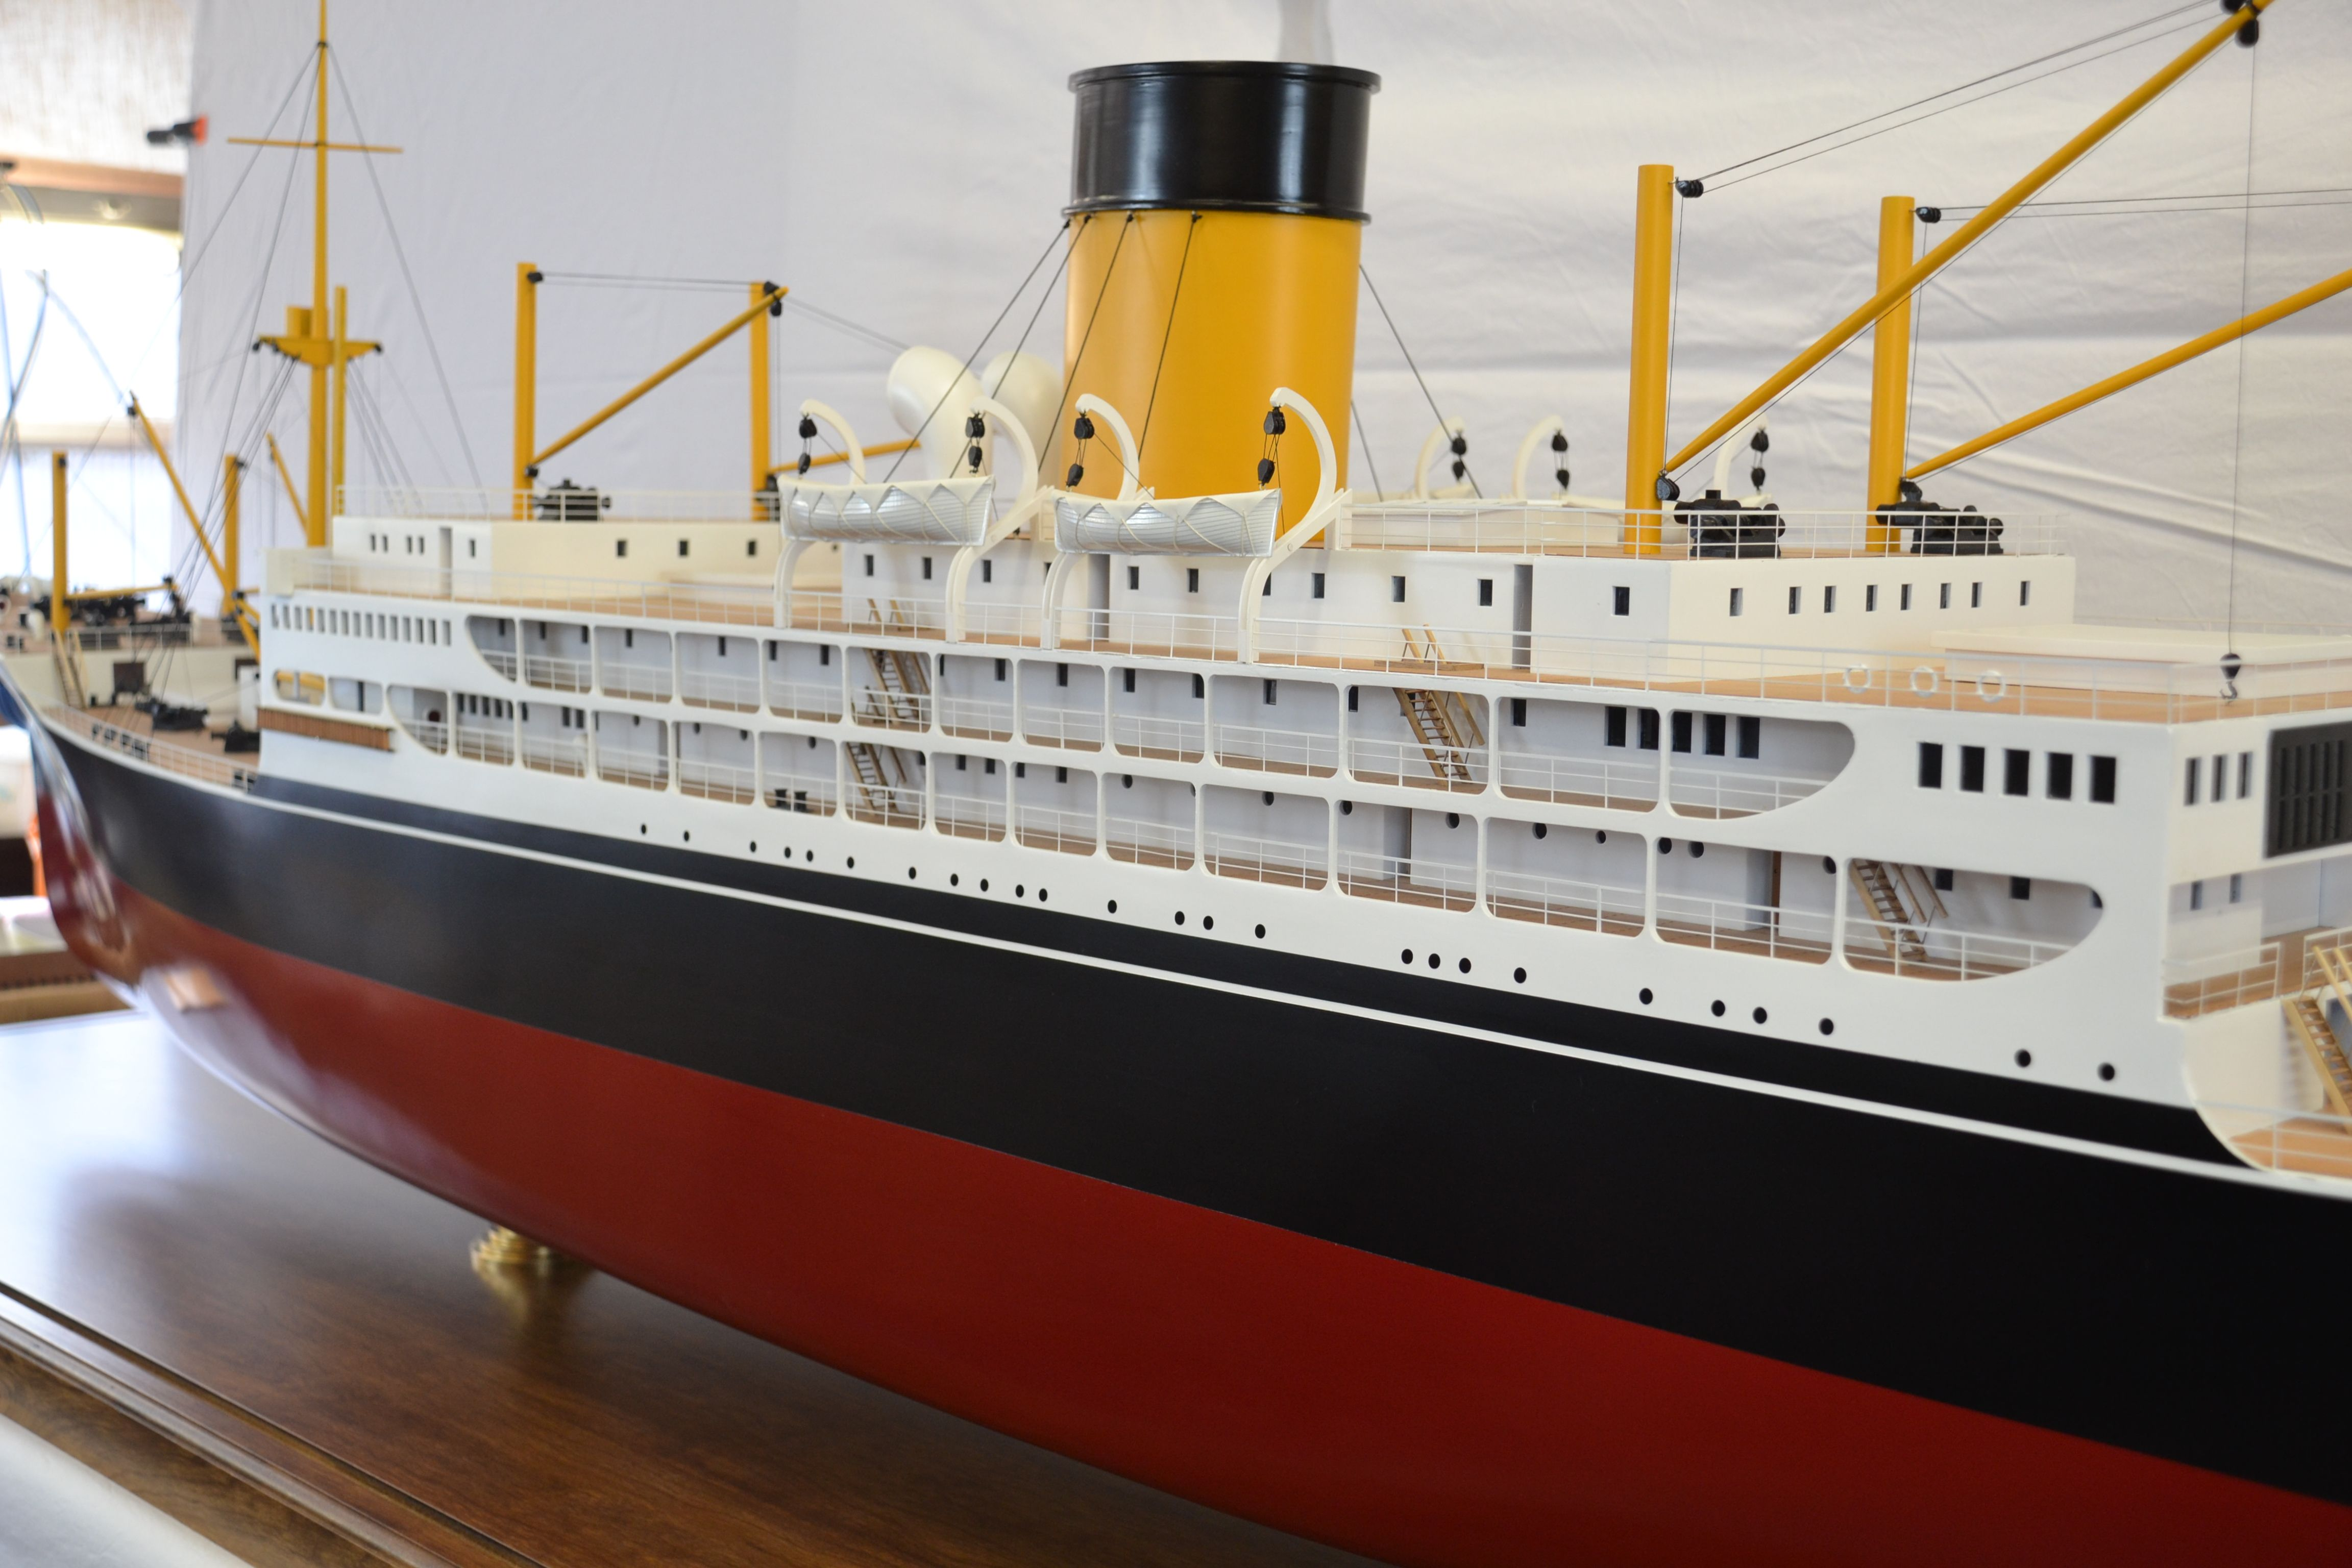 2209-12968-SS-Corinthic-Model-Ship